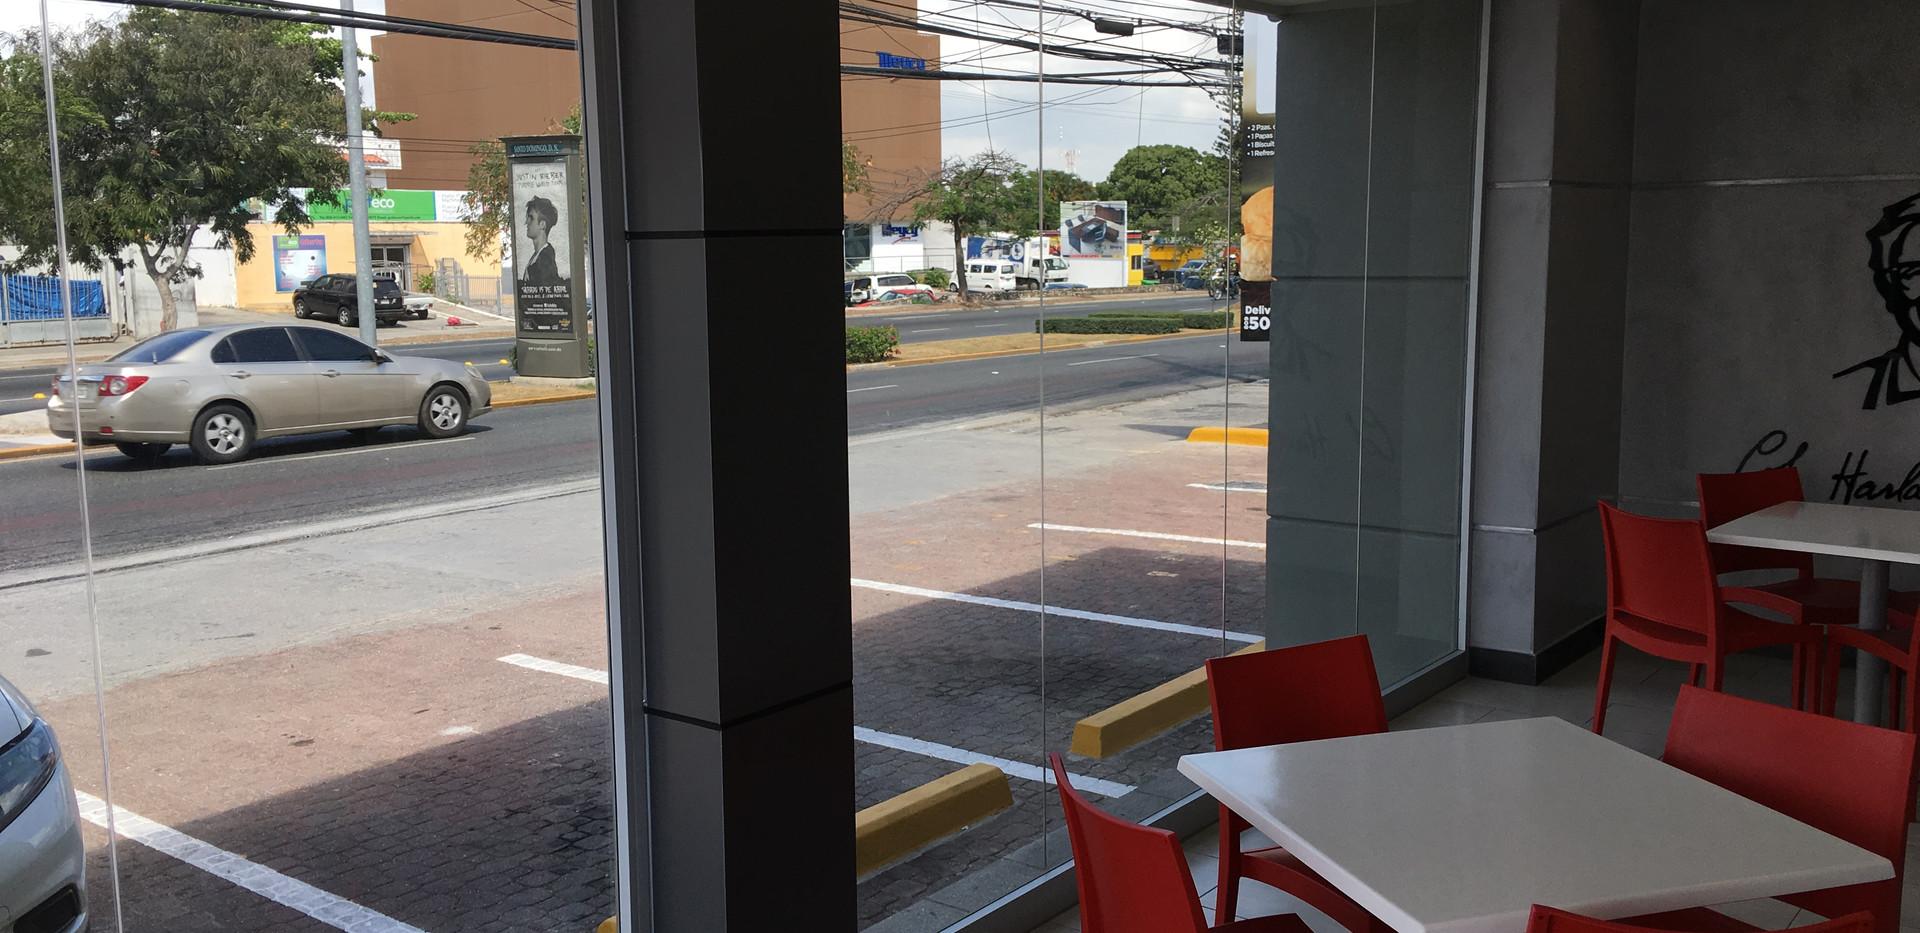 Laminado reflectivo 40% en KFC Nunez de Caceres, Santo Domingo